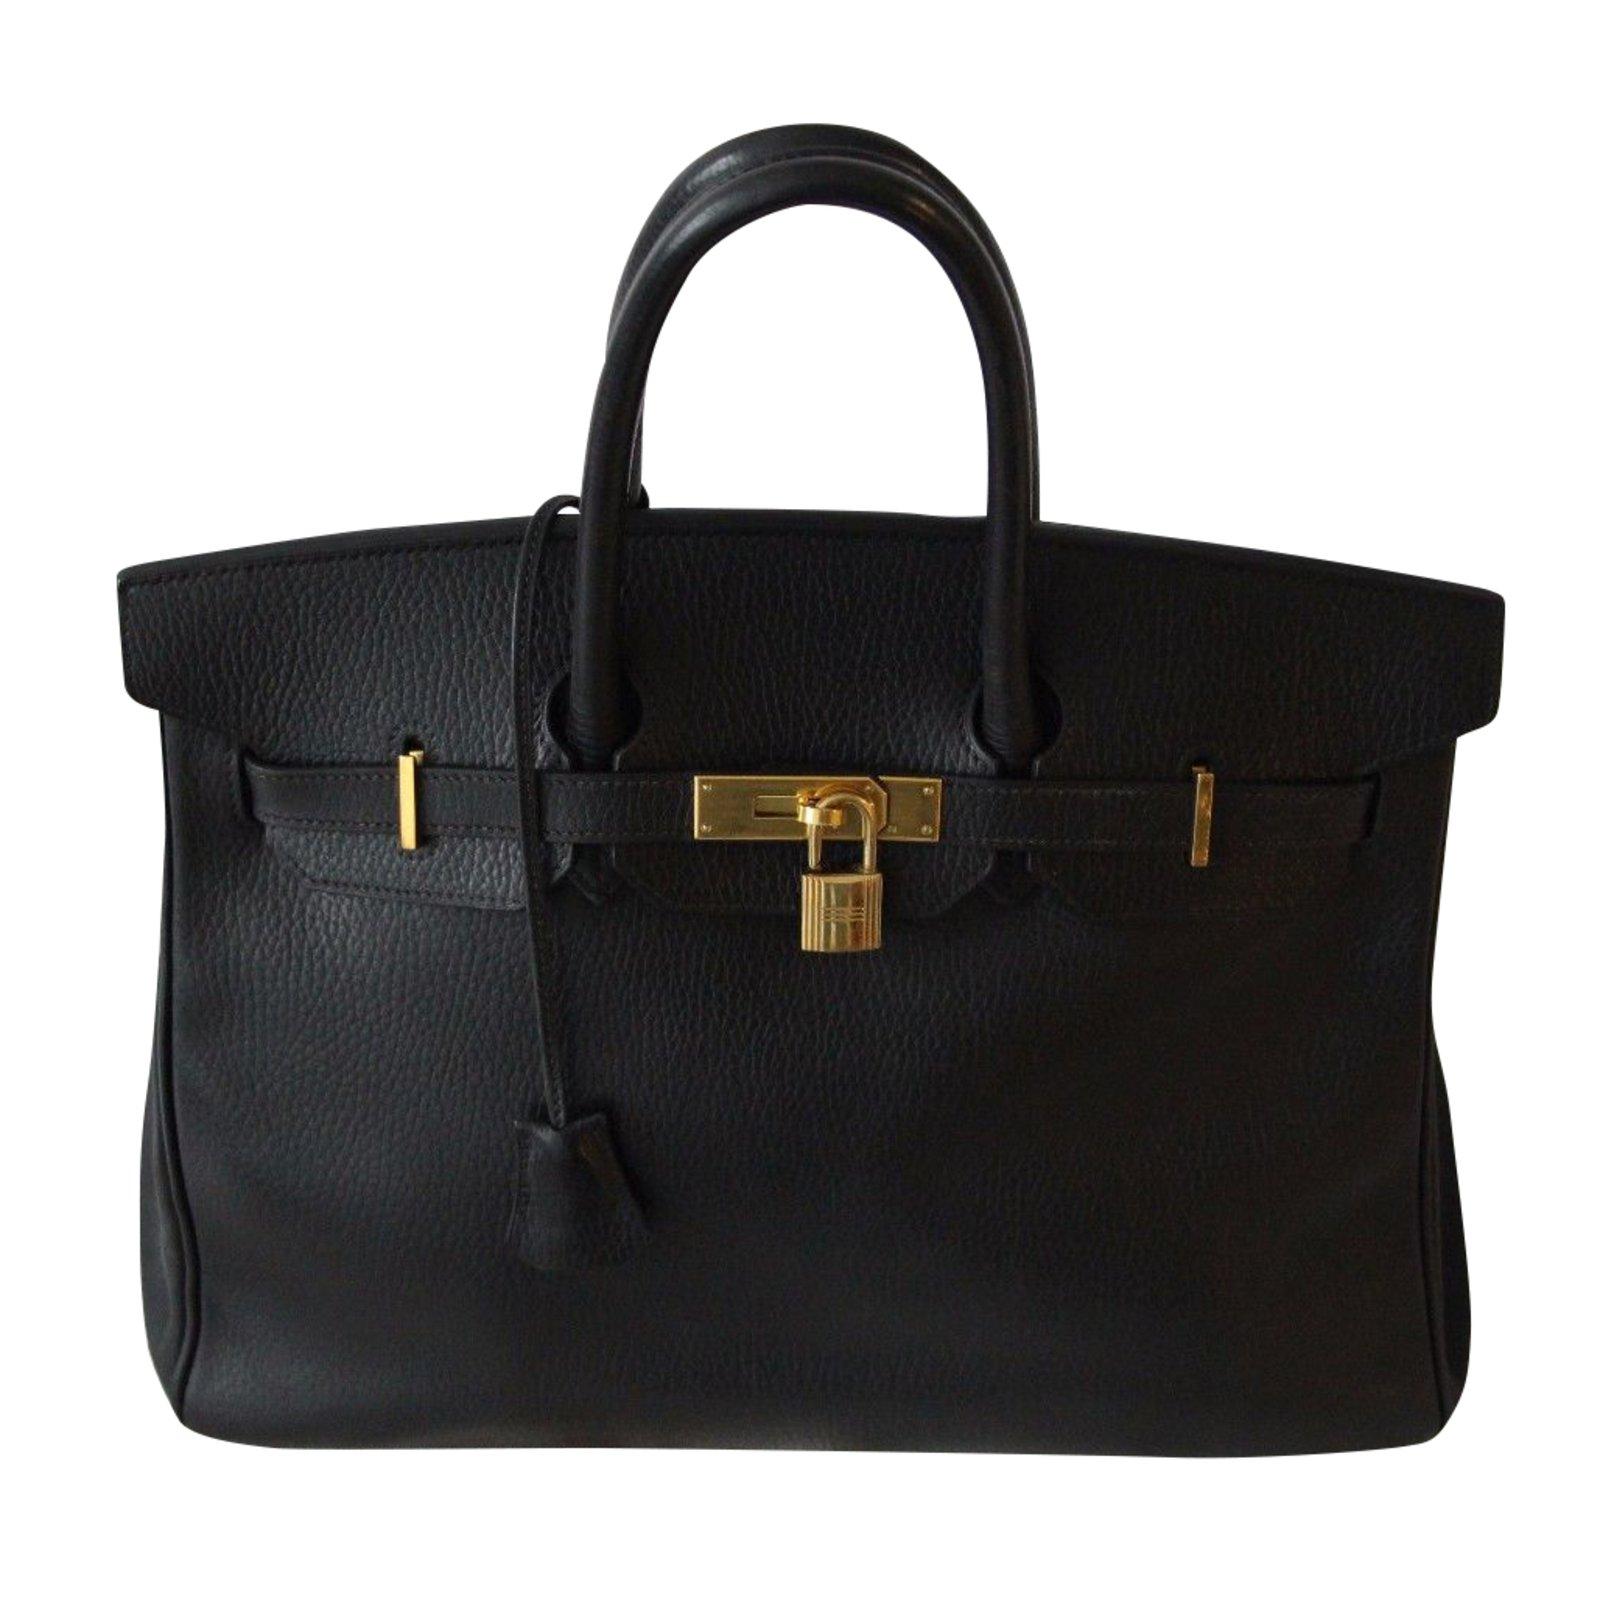 21f7167c71c Sacs à main Hermès Superbe sac Birkin 35 cm Hermès cuir vache Ardennes Cuir  Noir ref